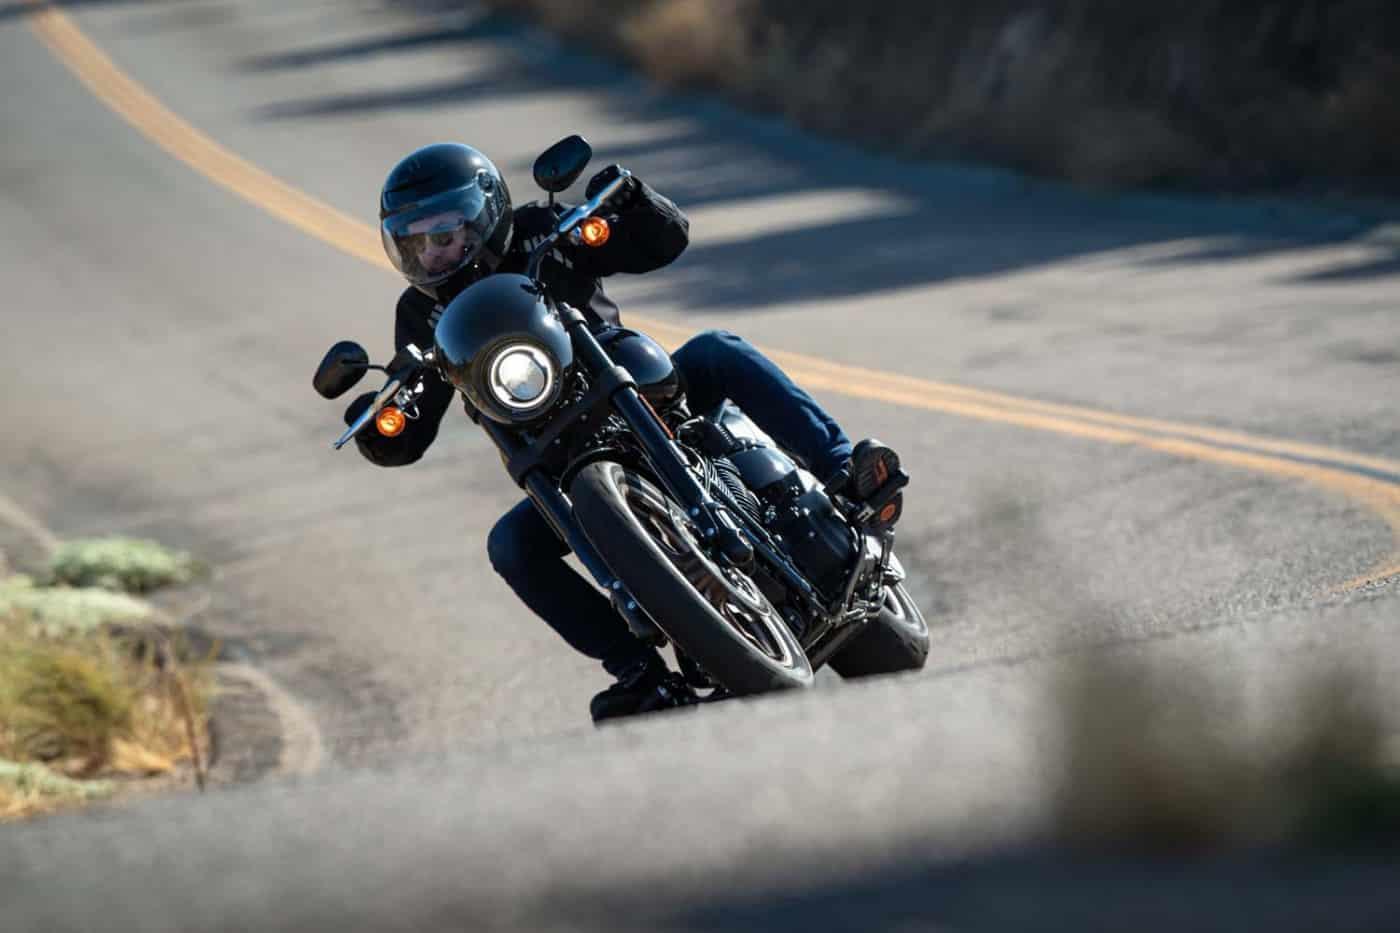 2020 Harley-Davidson Low Rider S Farbe Vivid Black